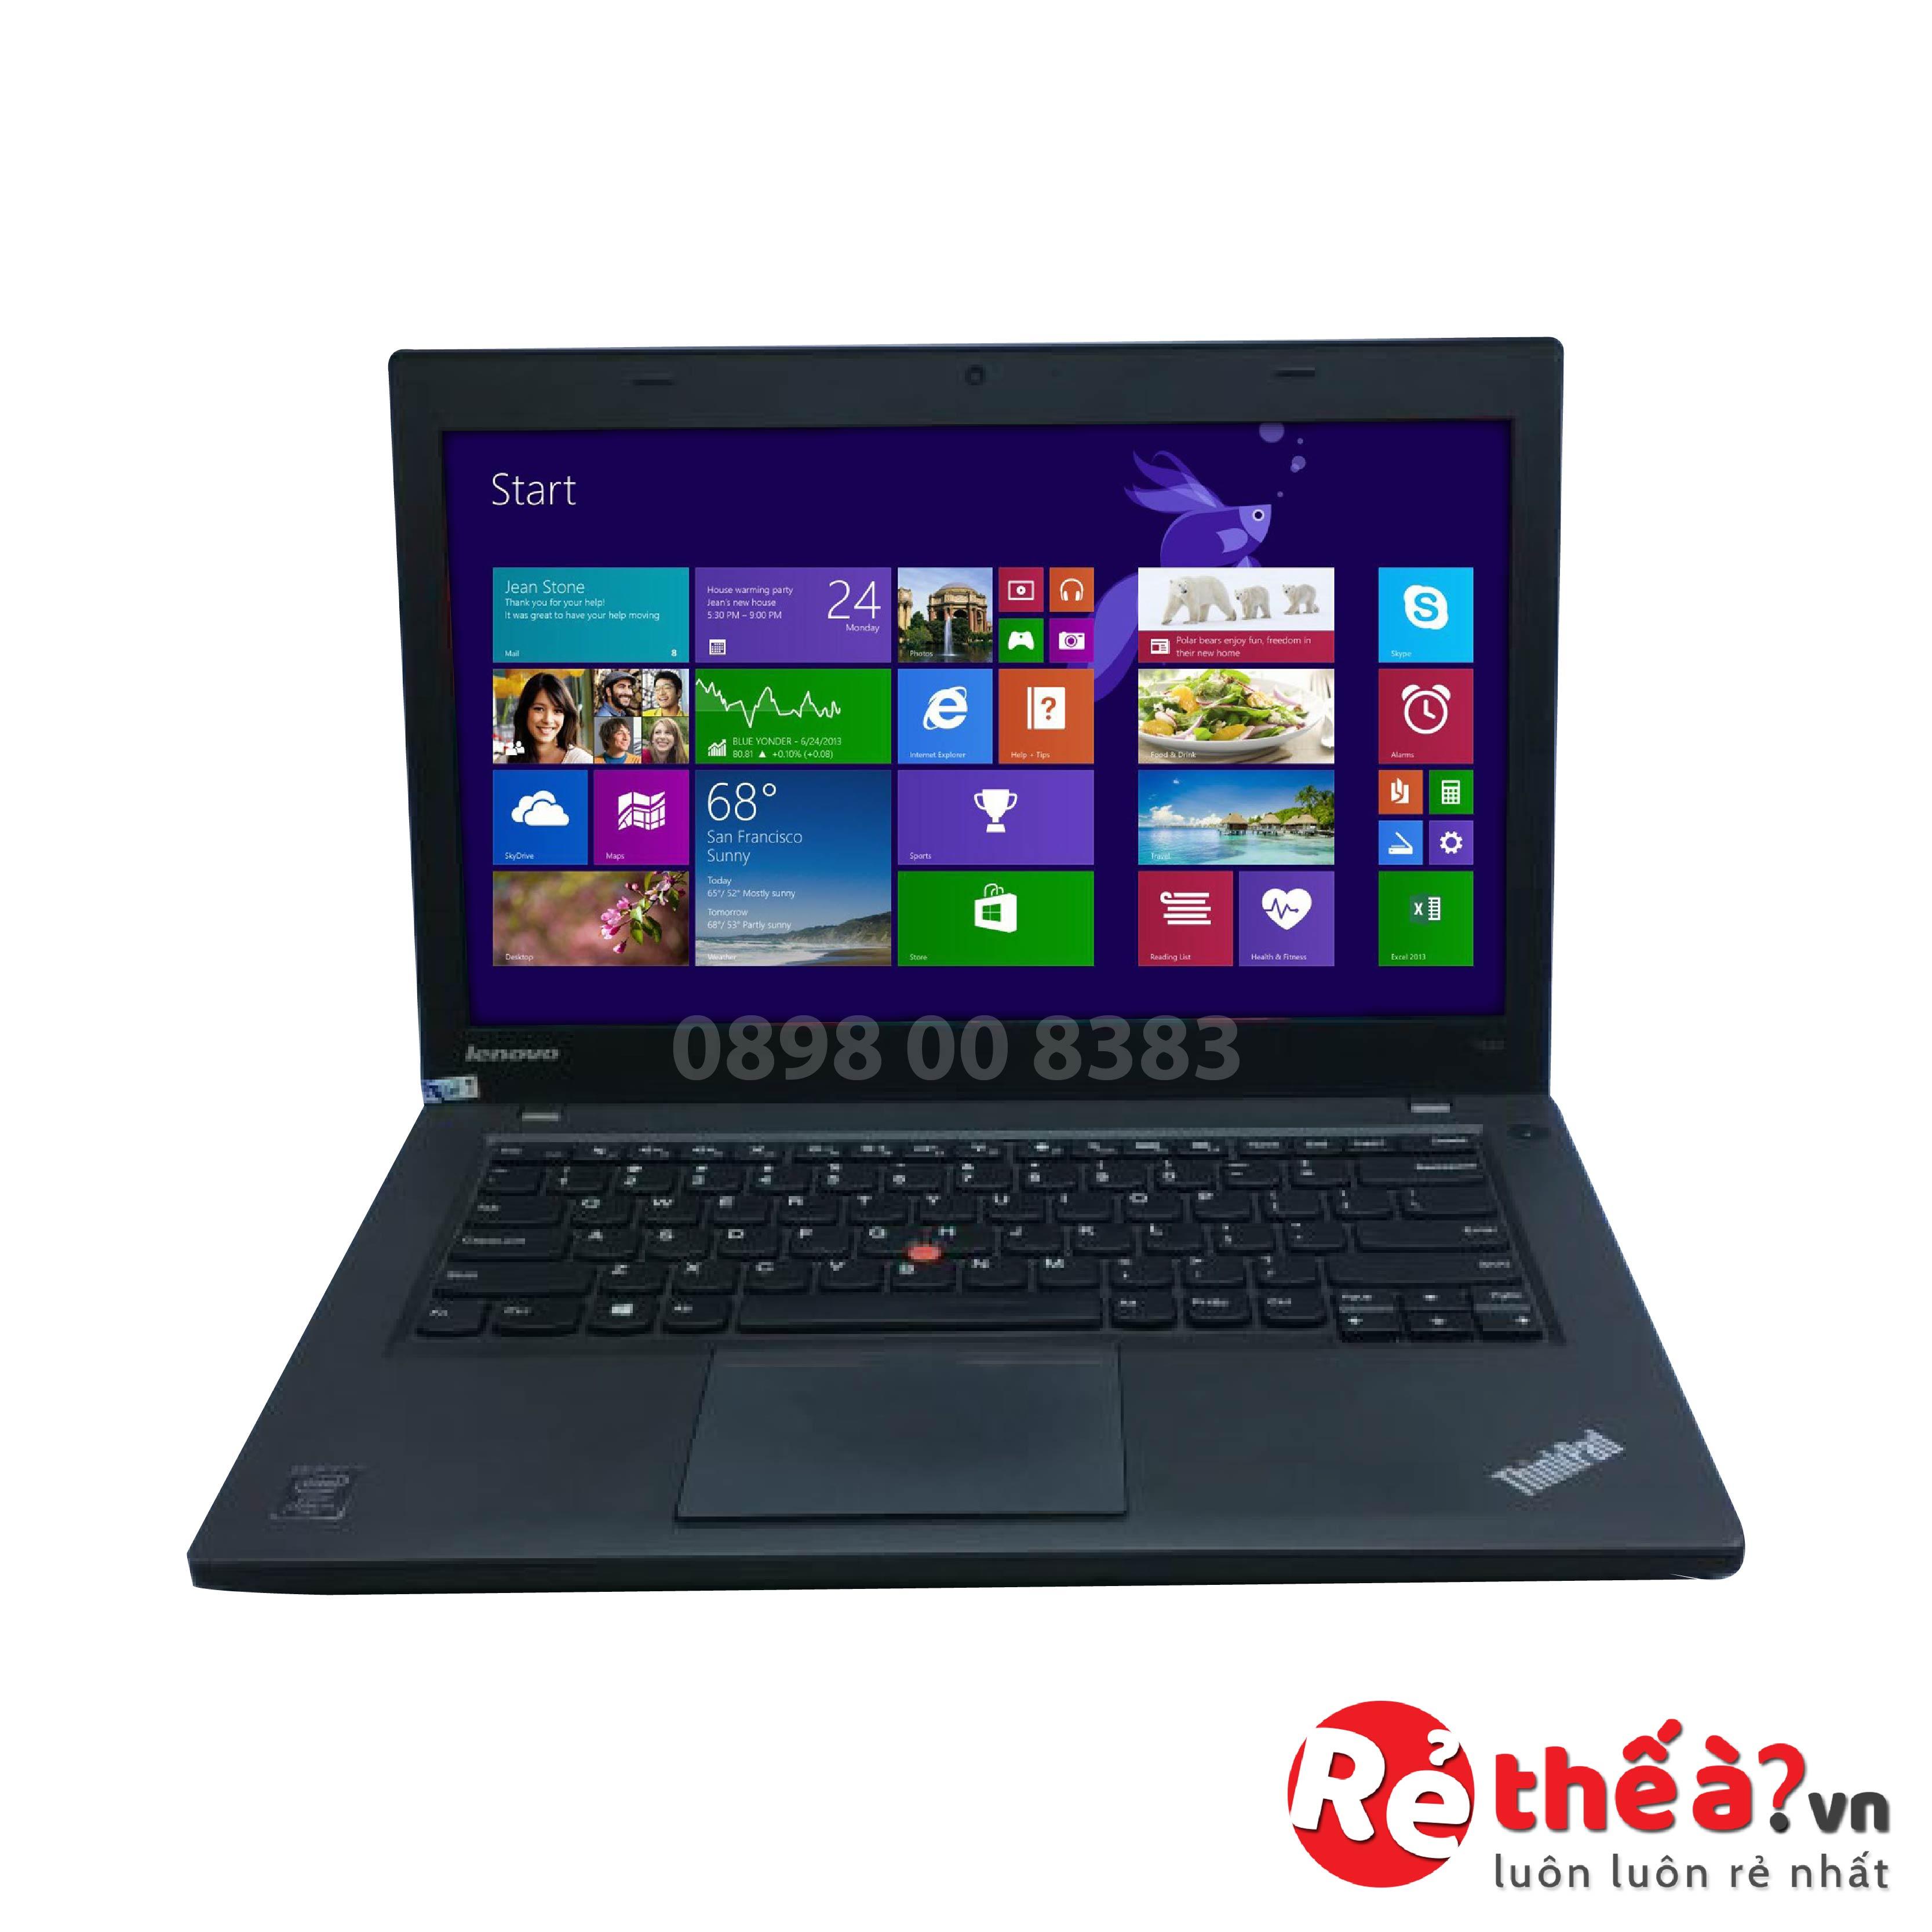 Laptop Lenovo Thinkpad T440